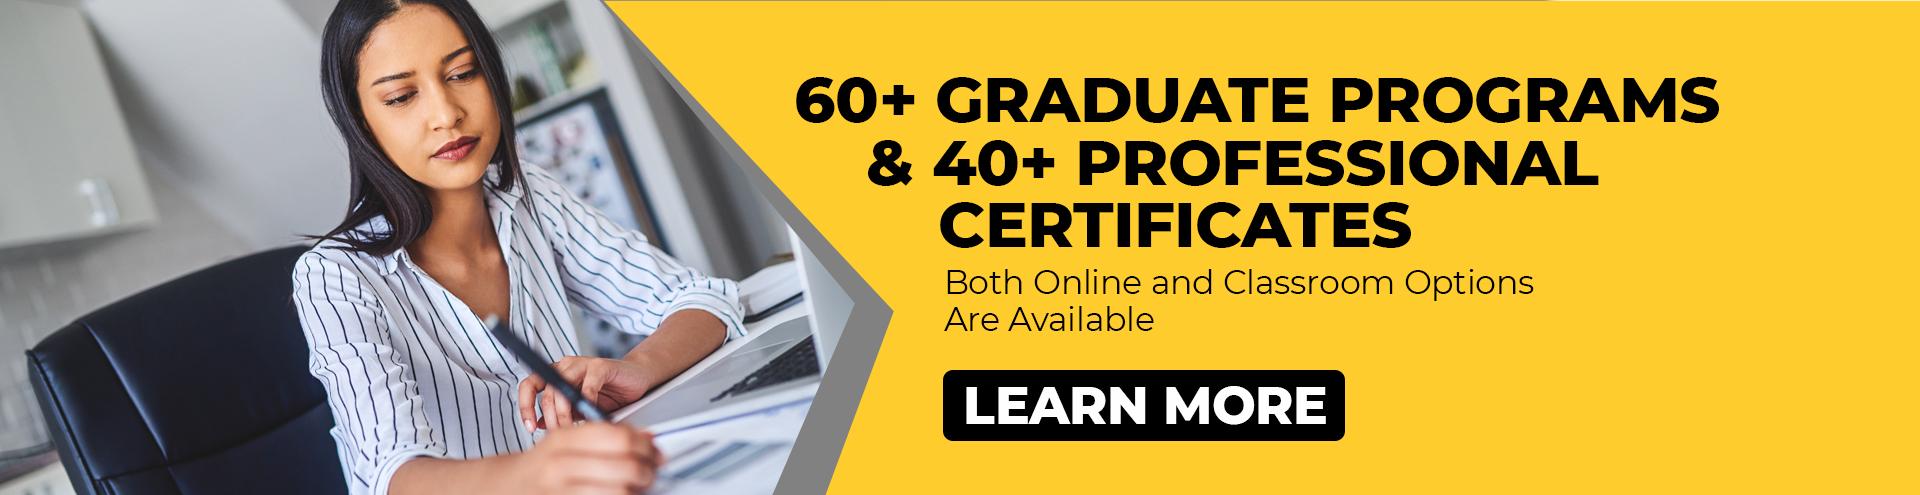 60+ graduate programs & 40+ professional certificates.